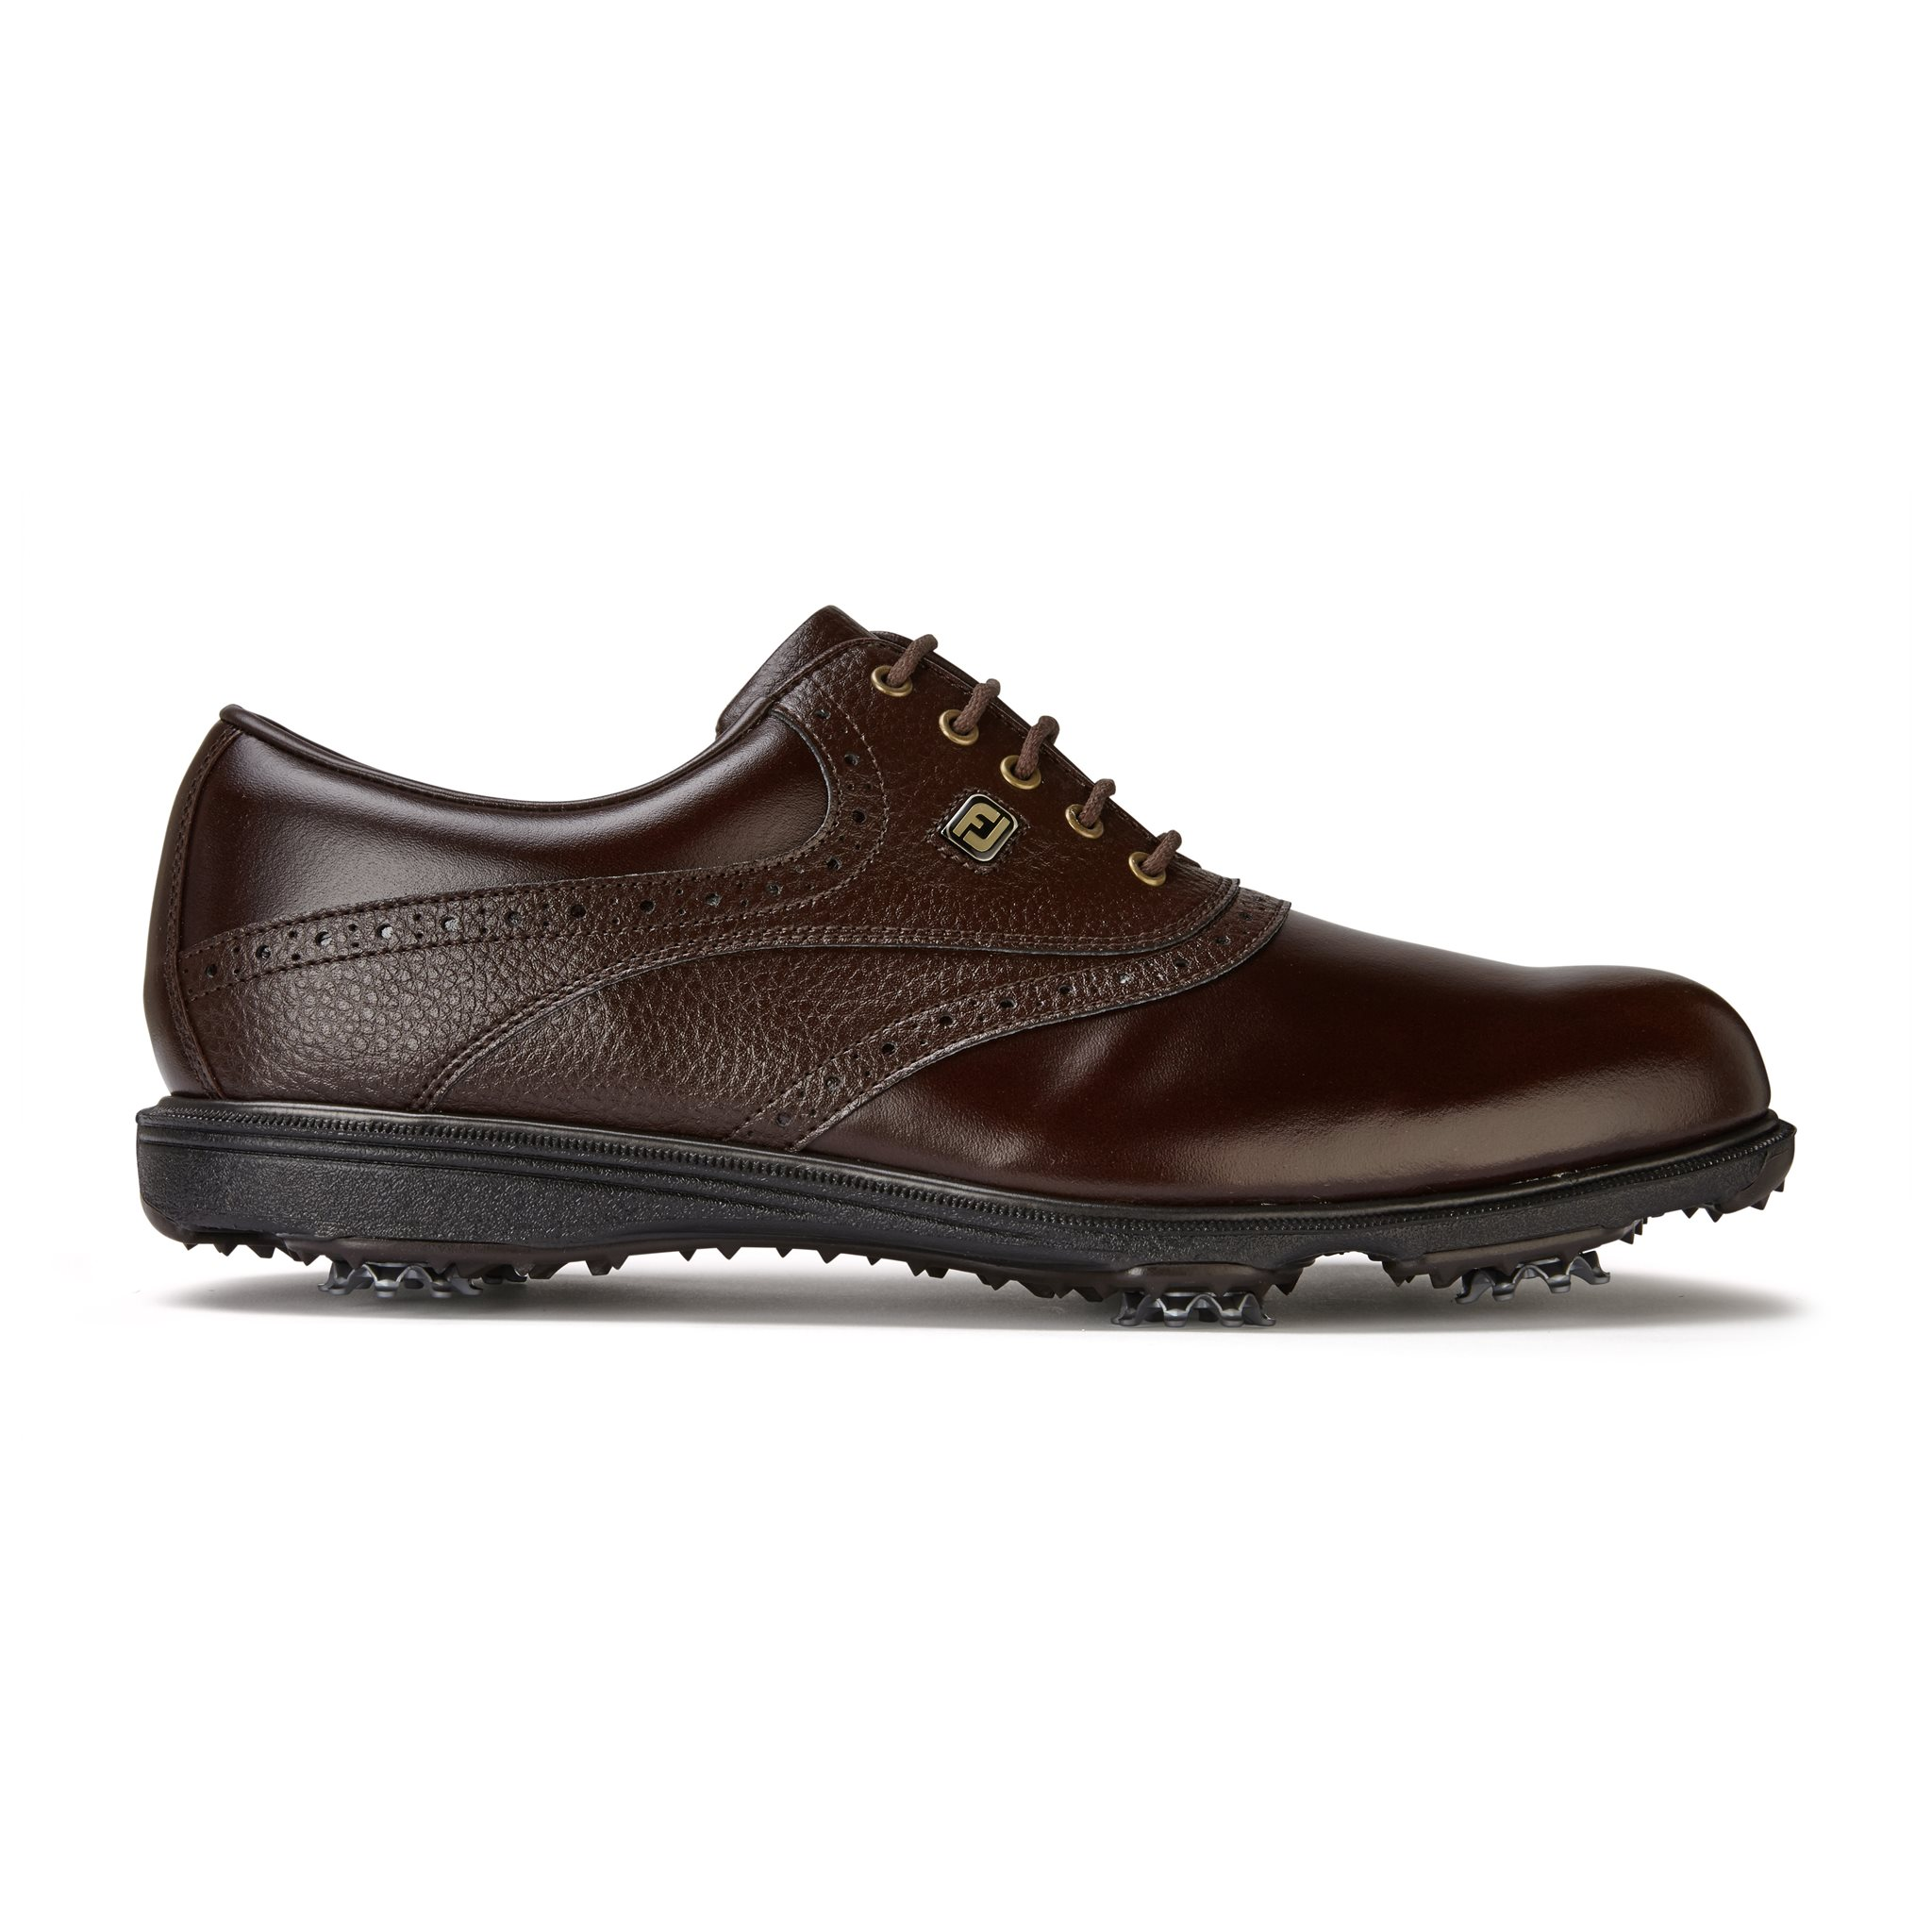 FootJoy heren golfschoenen Hydrolite 2.0 bruin